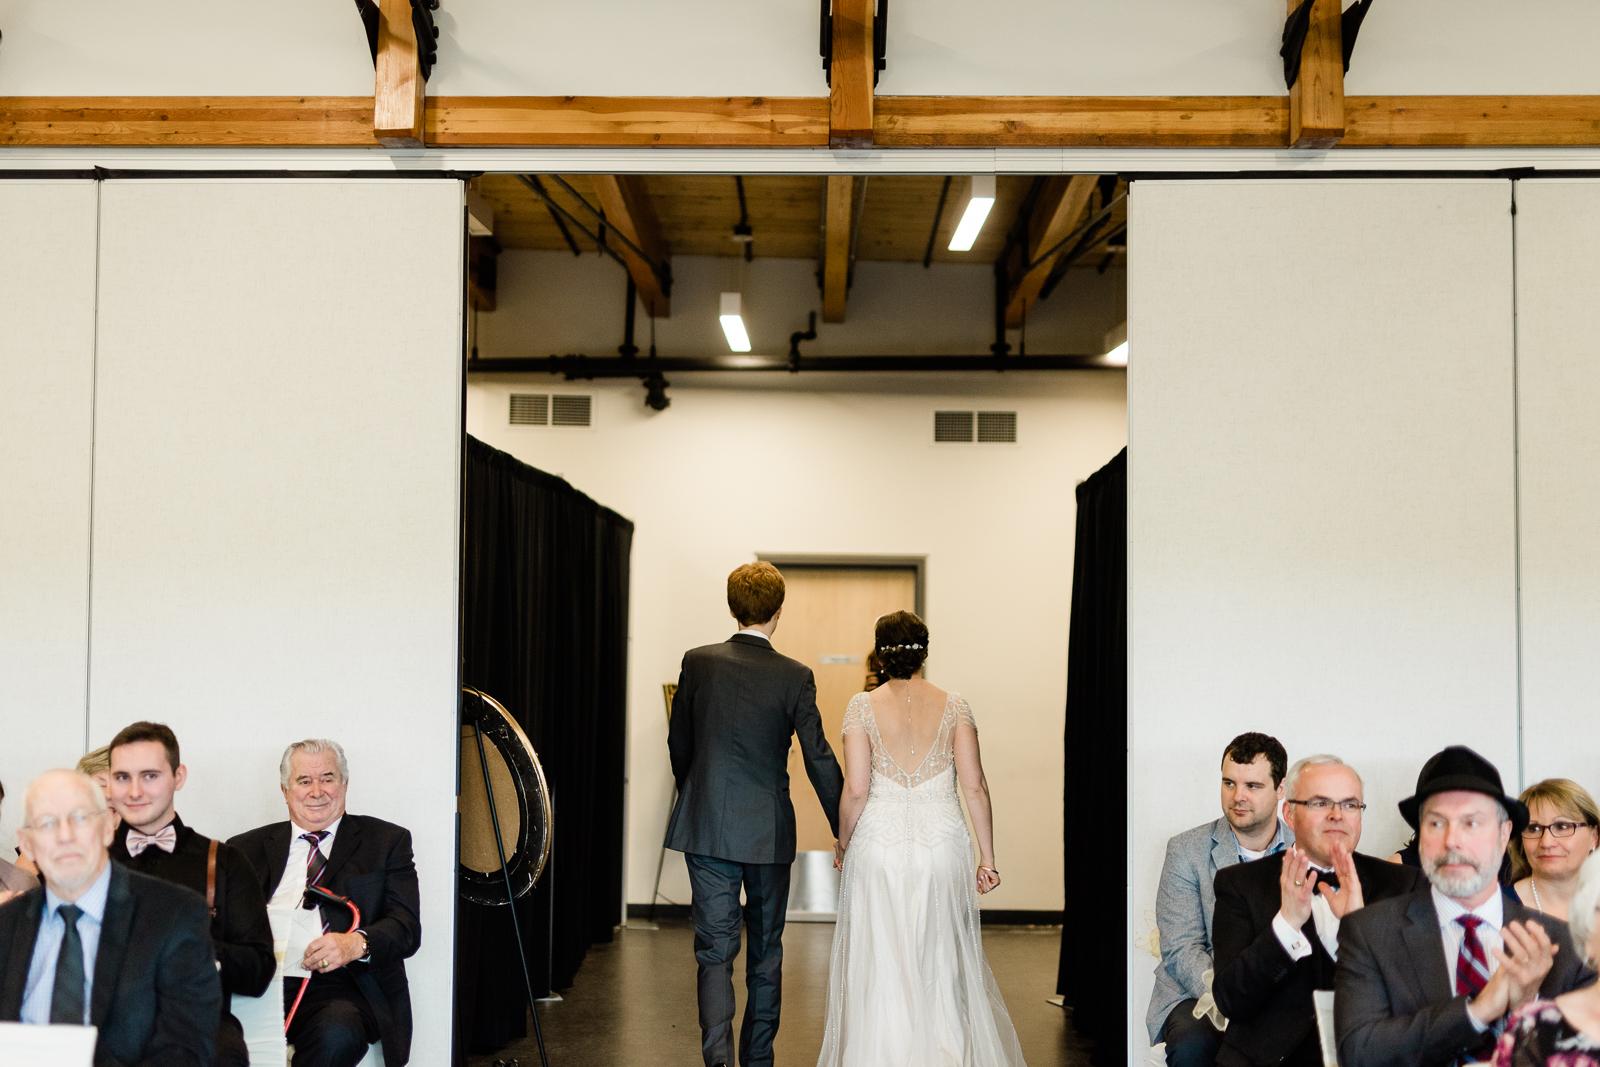 0060manuels-river-st-johns-wedding-photographer.jpg